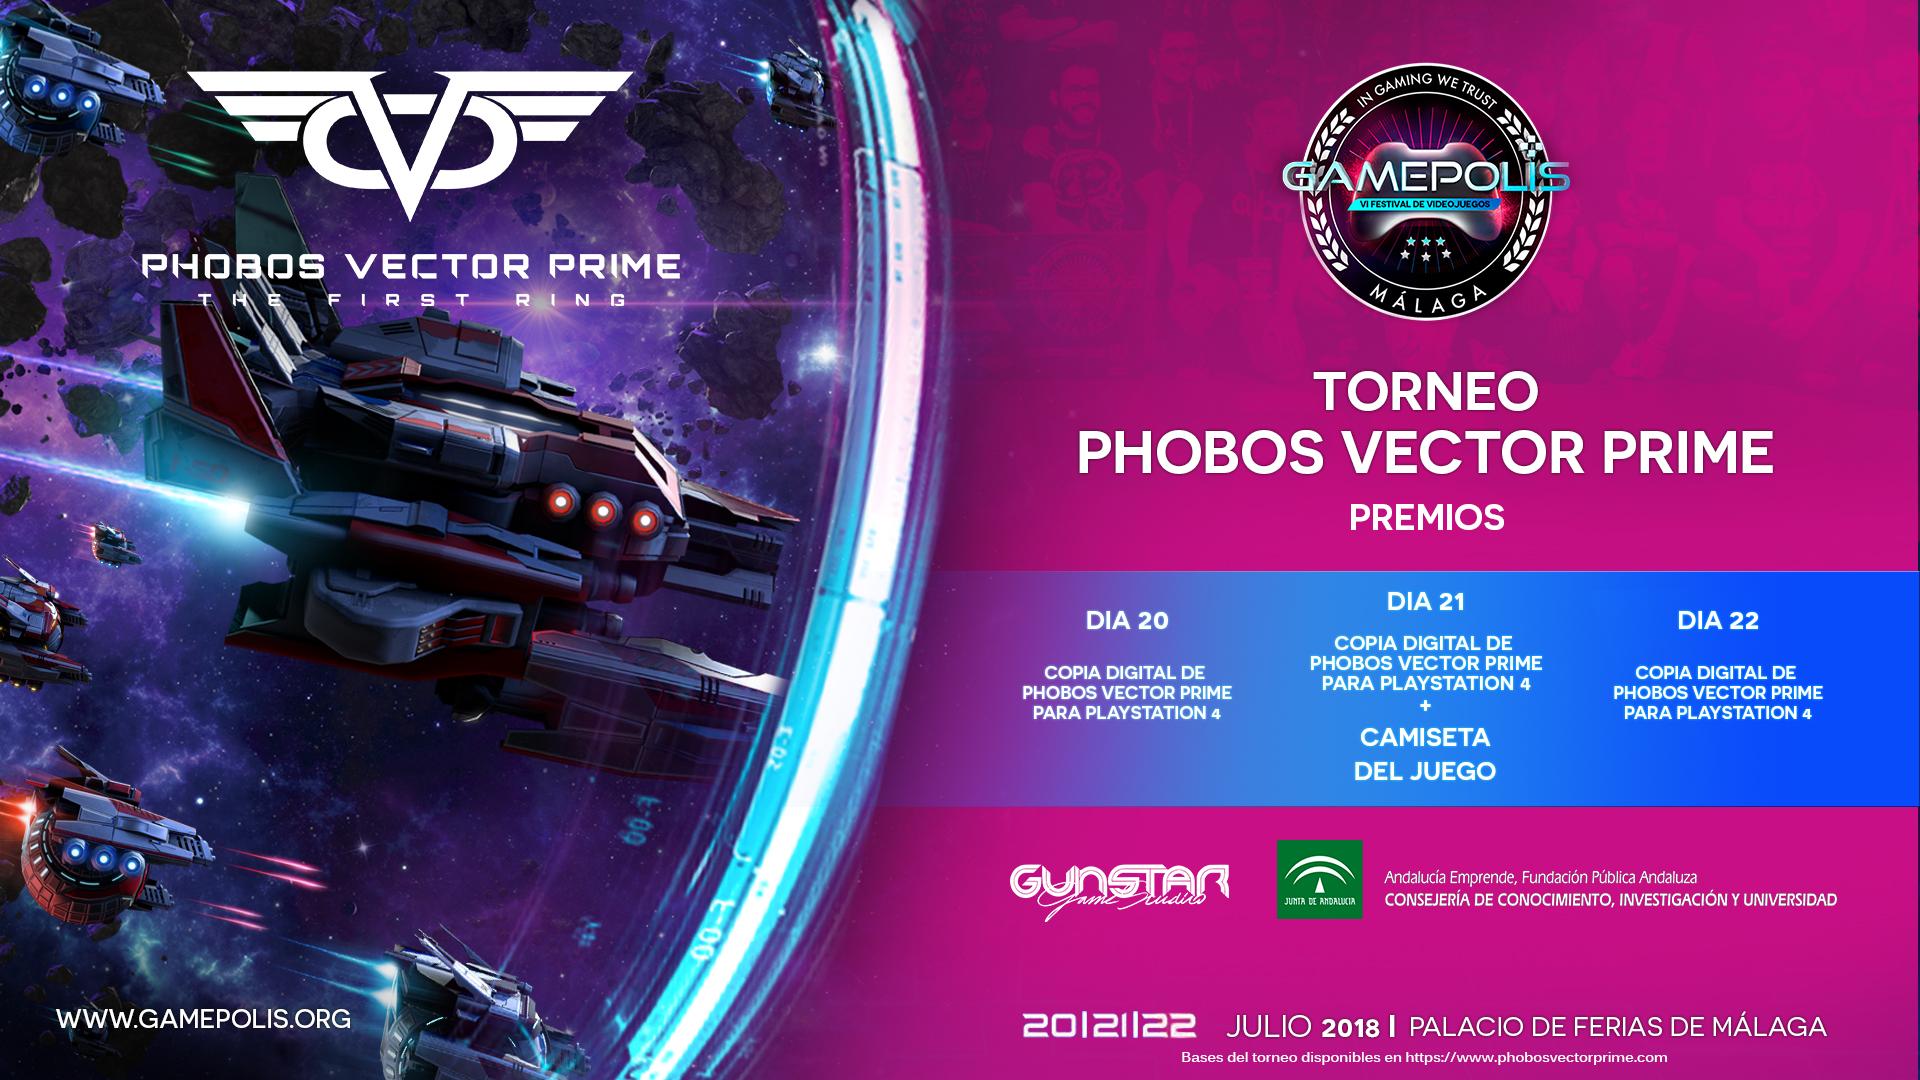 Cartel Torneo Gamepolis 2018 - Phobos Vector Prime